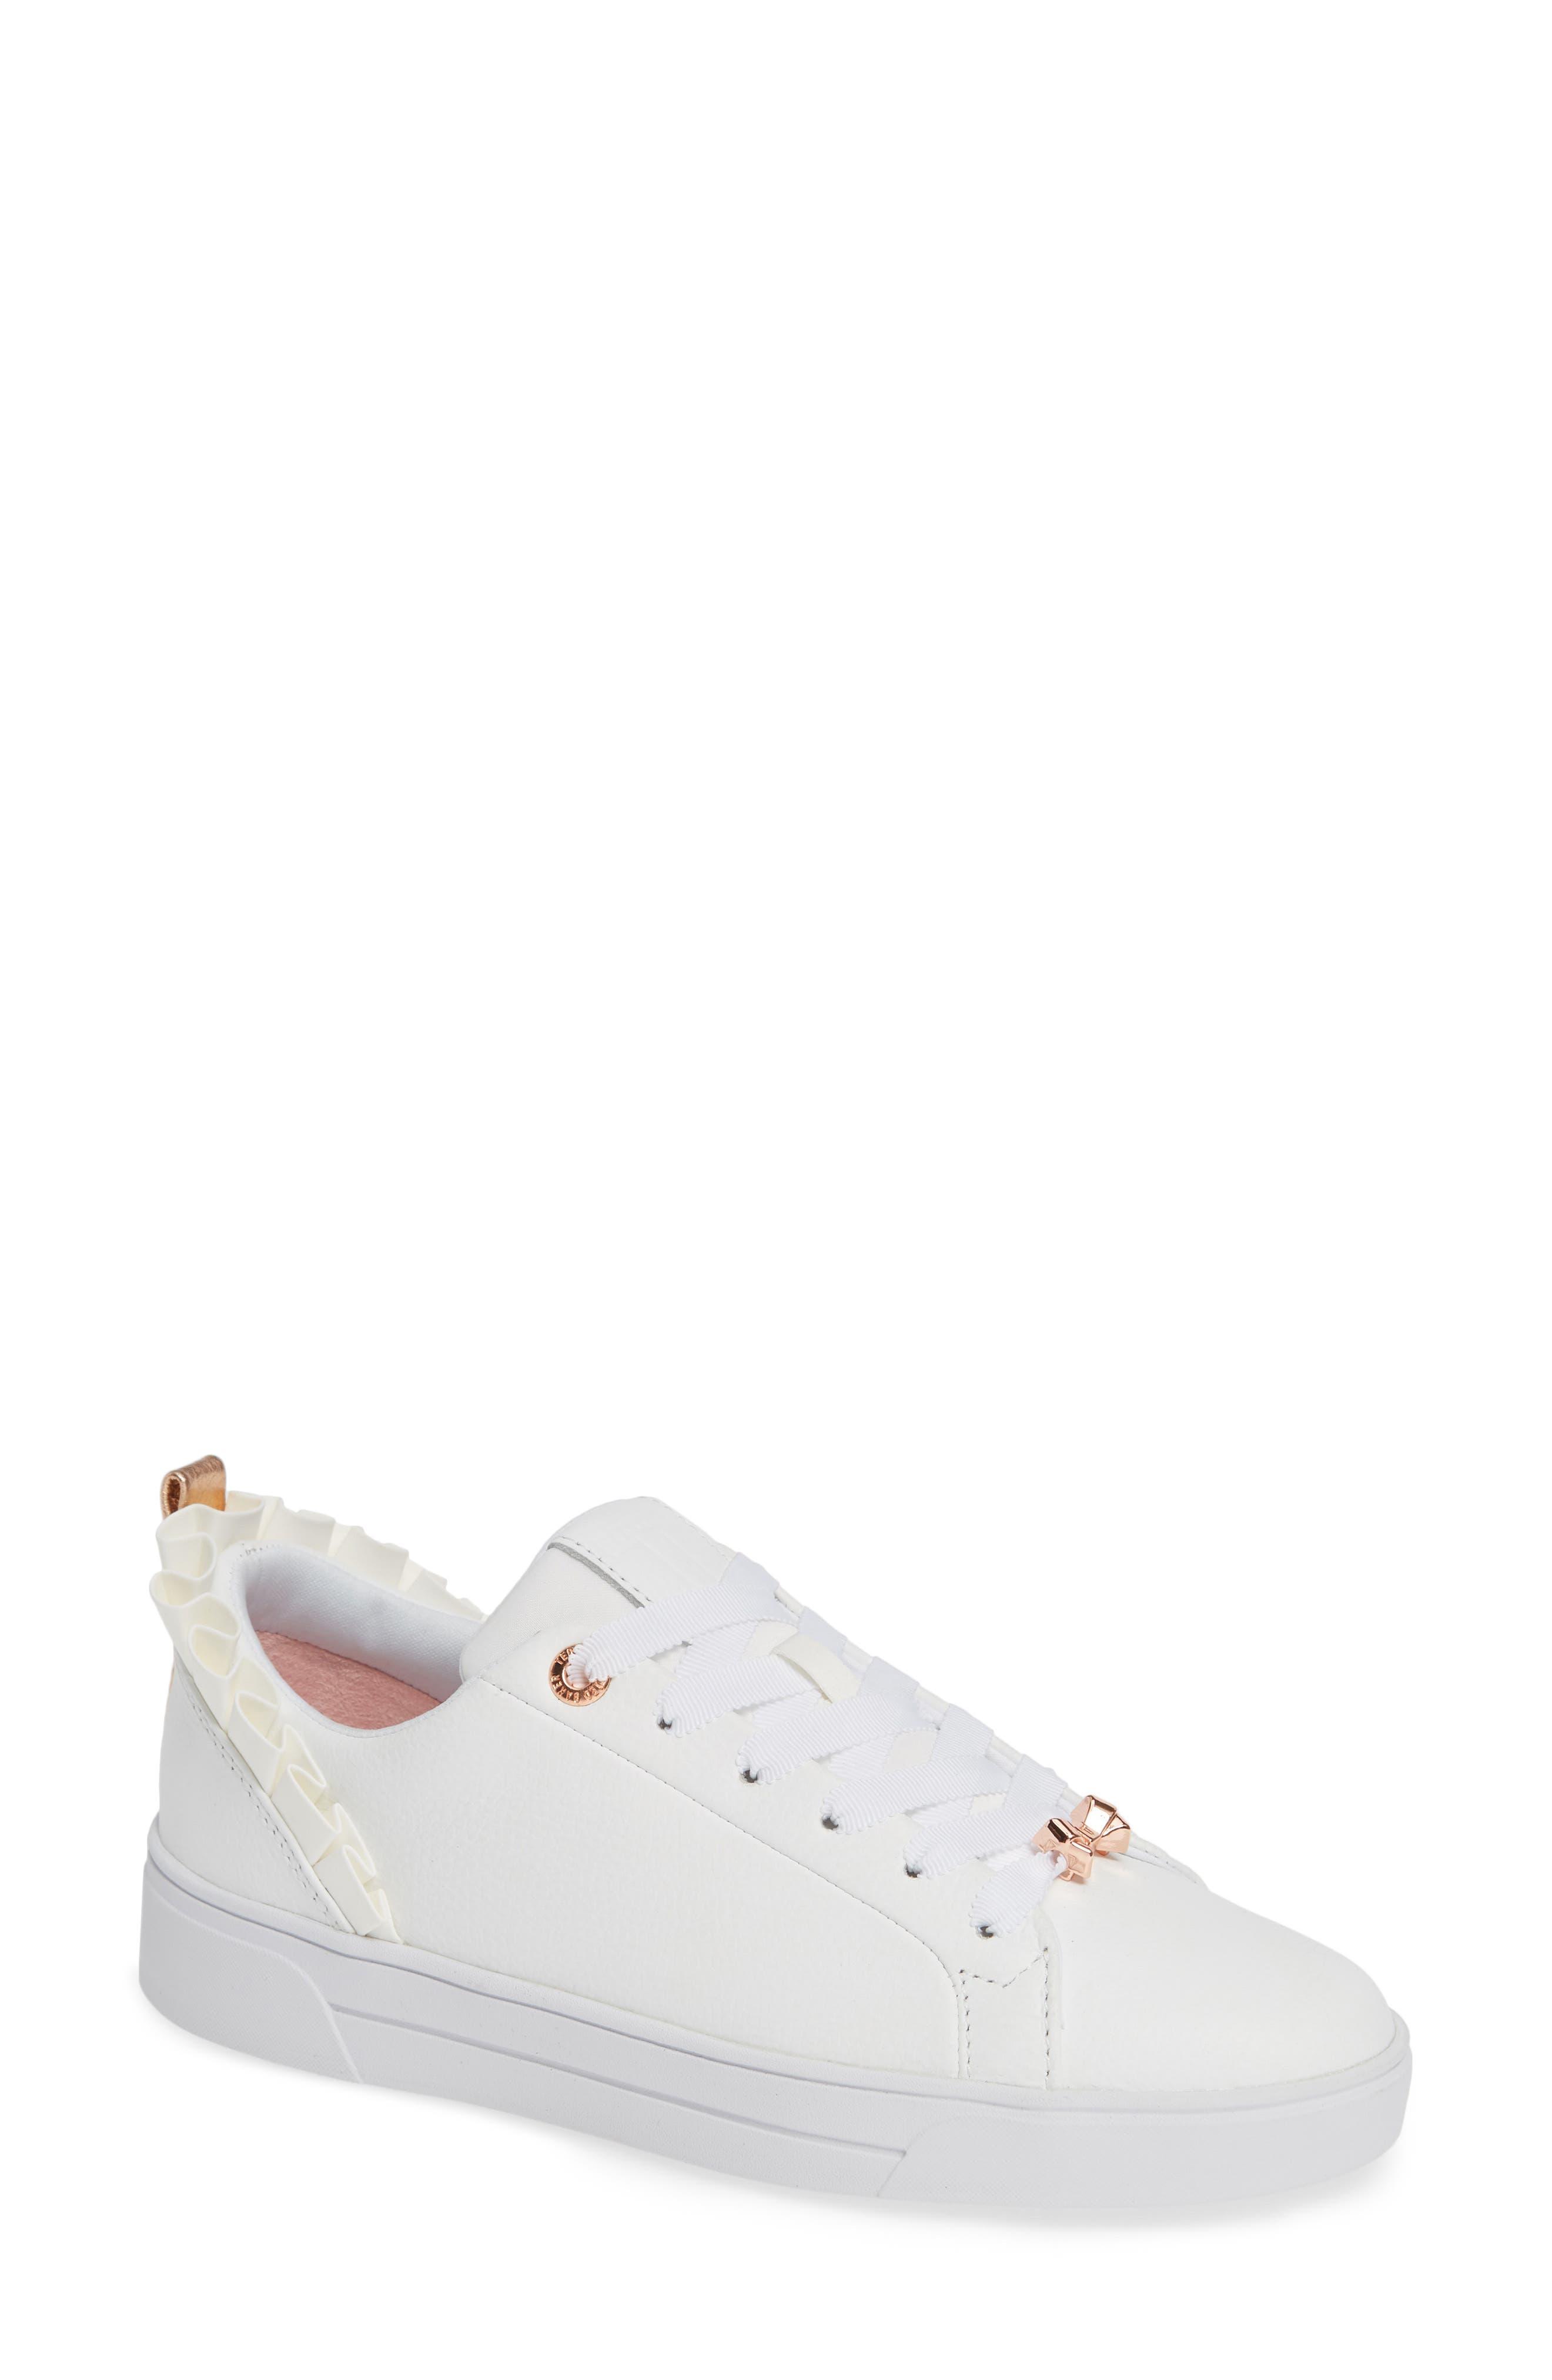 Astrina Sneaker,                             Main thumbnail 1, color,                             WHITE LEATHER